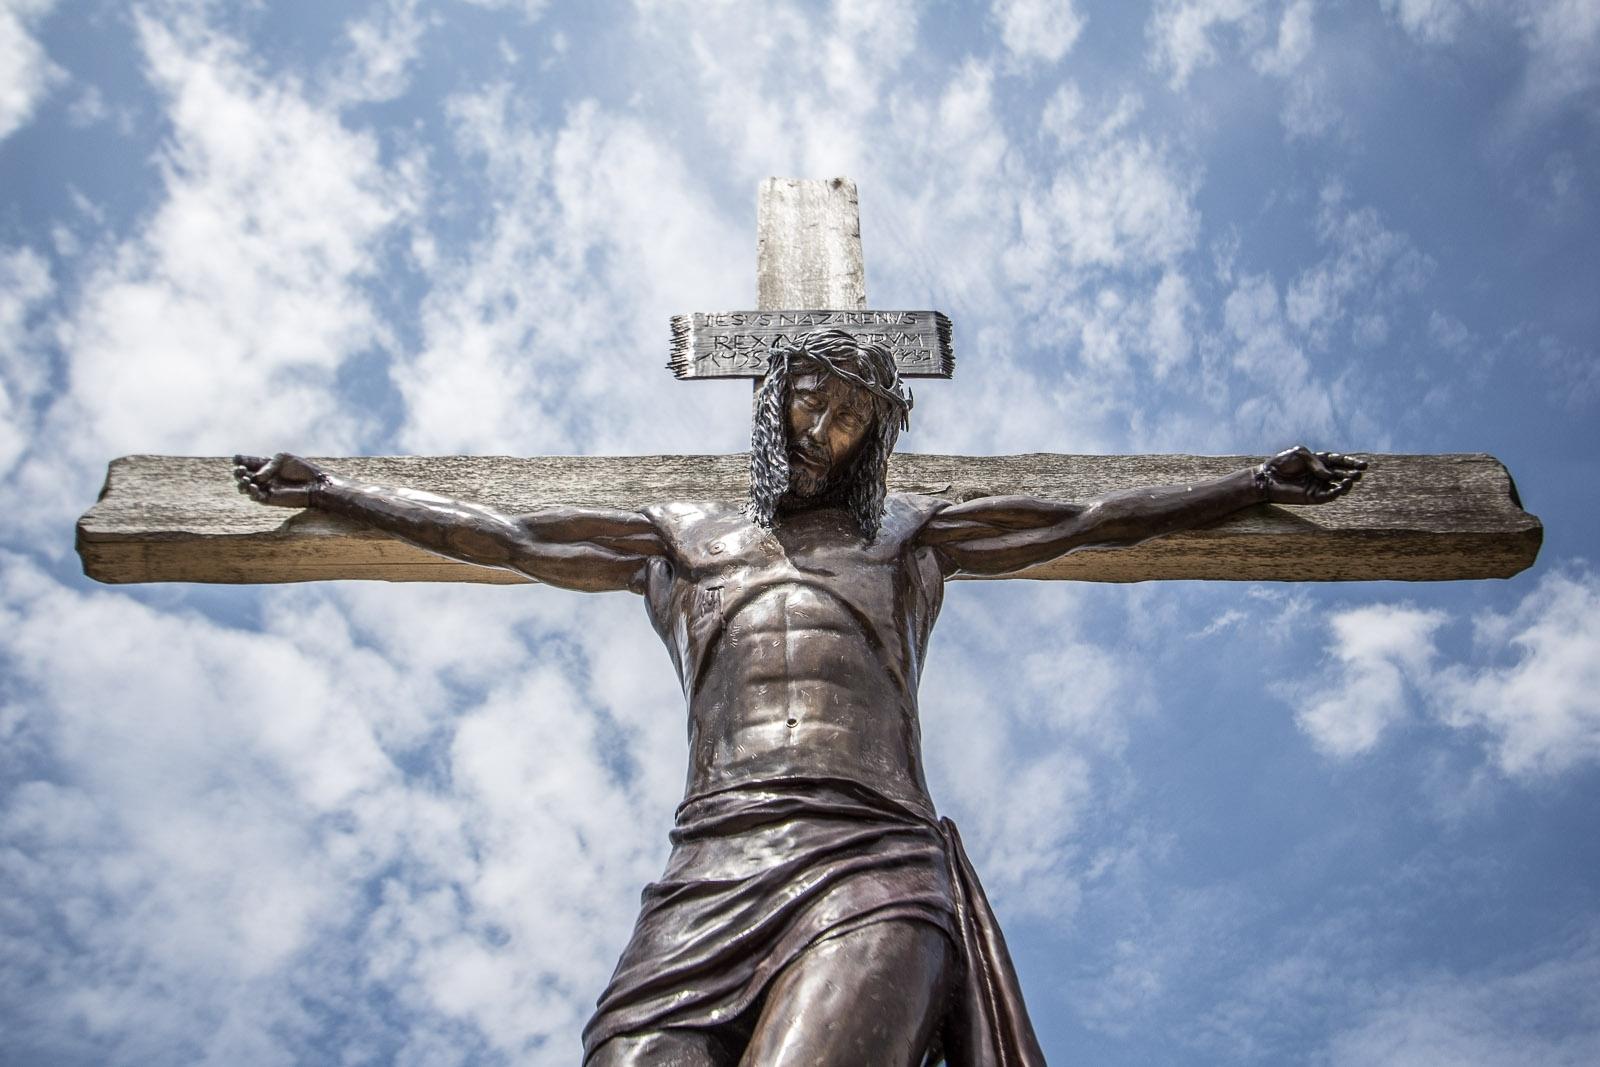 seven last words of jesus christ from the cross - crossroads initiative